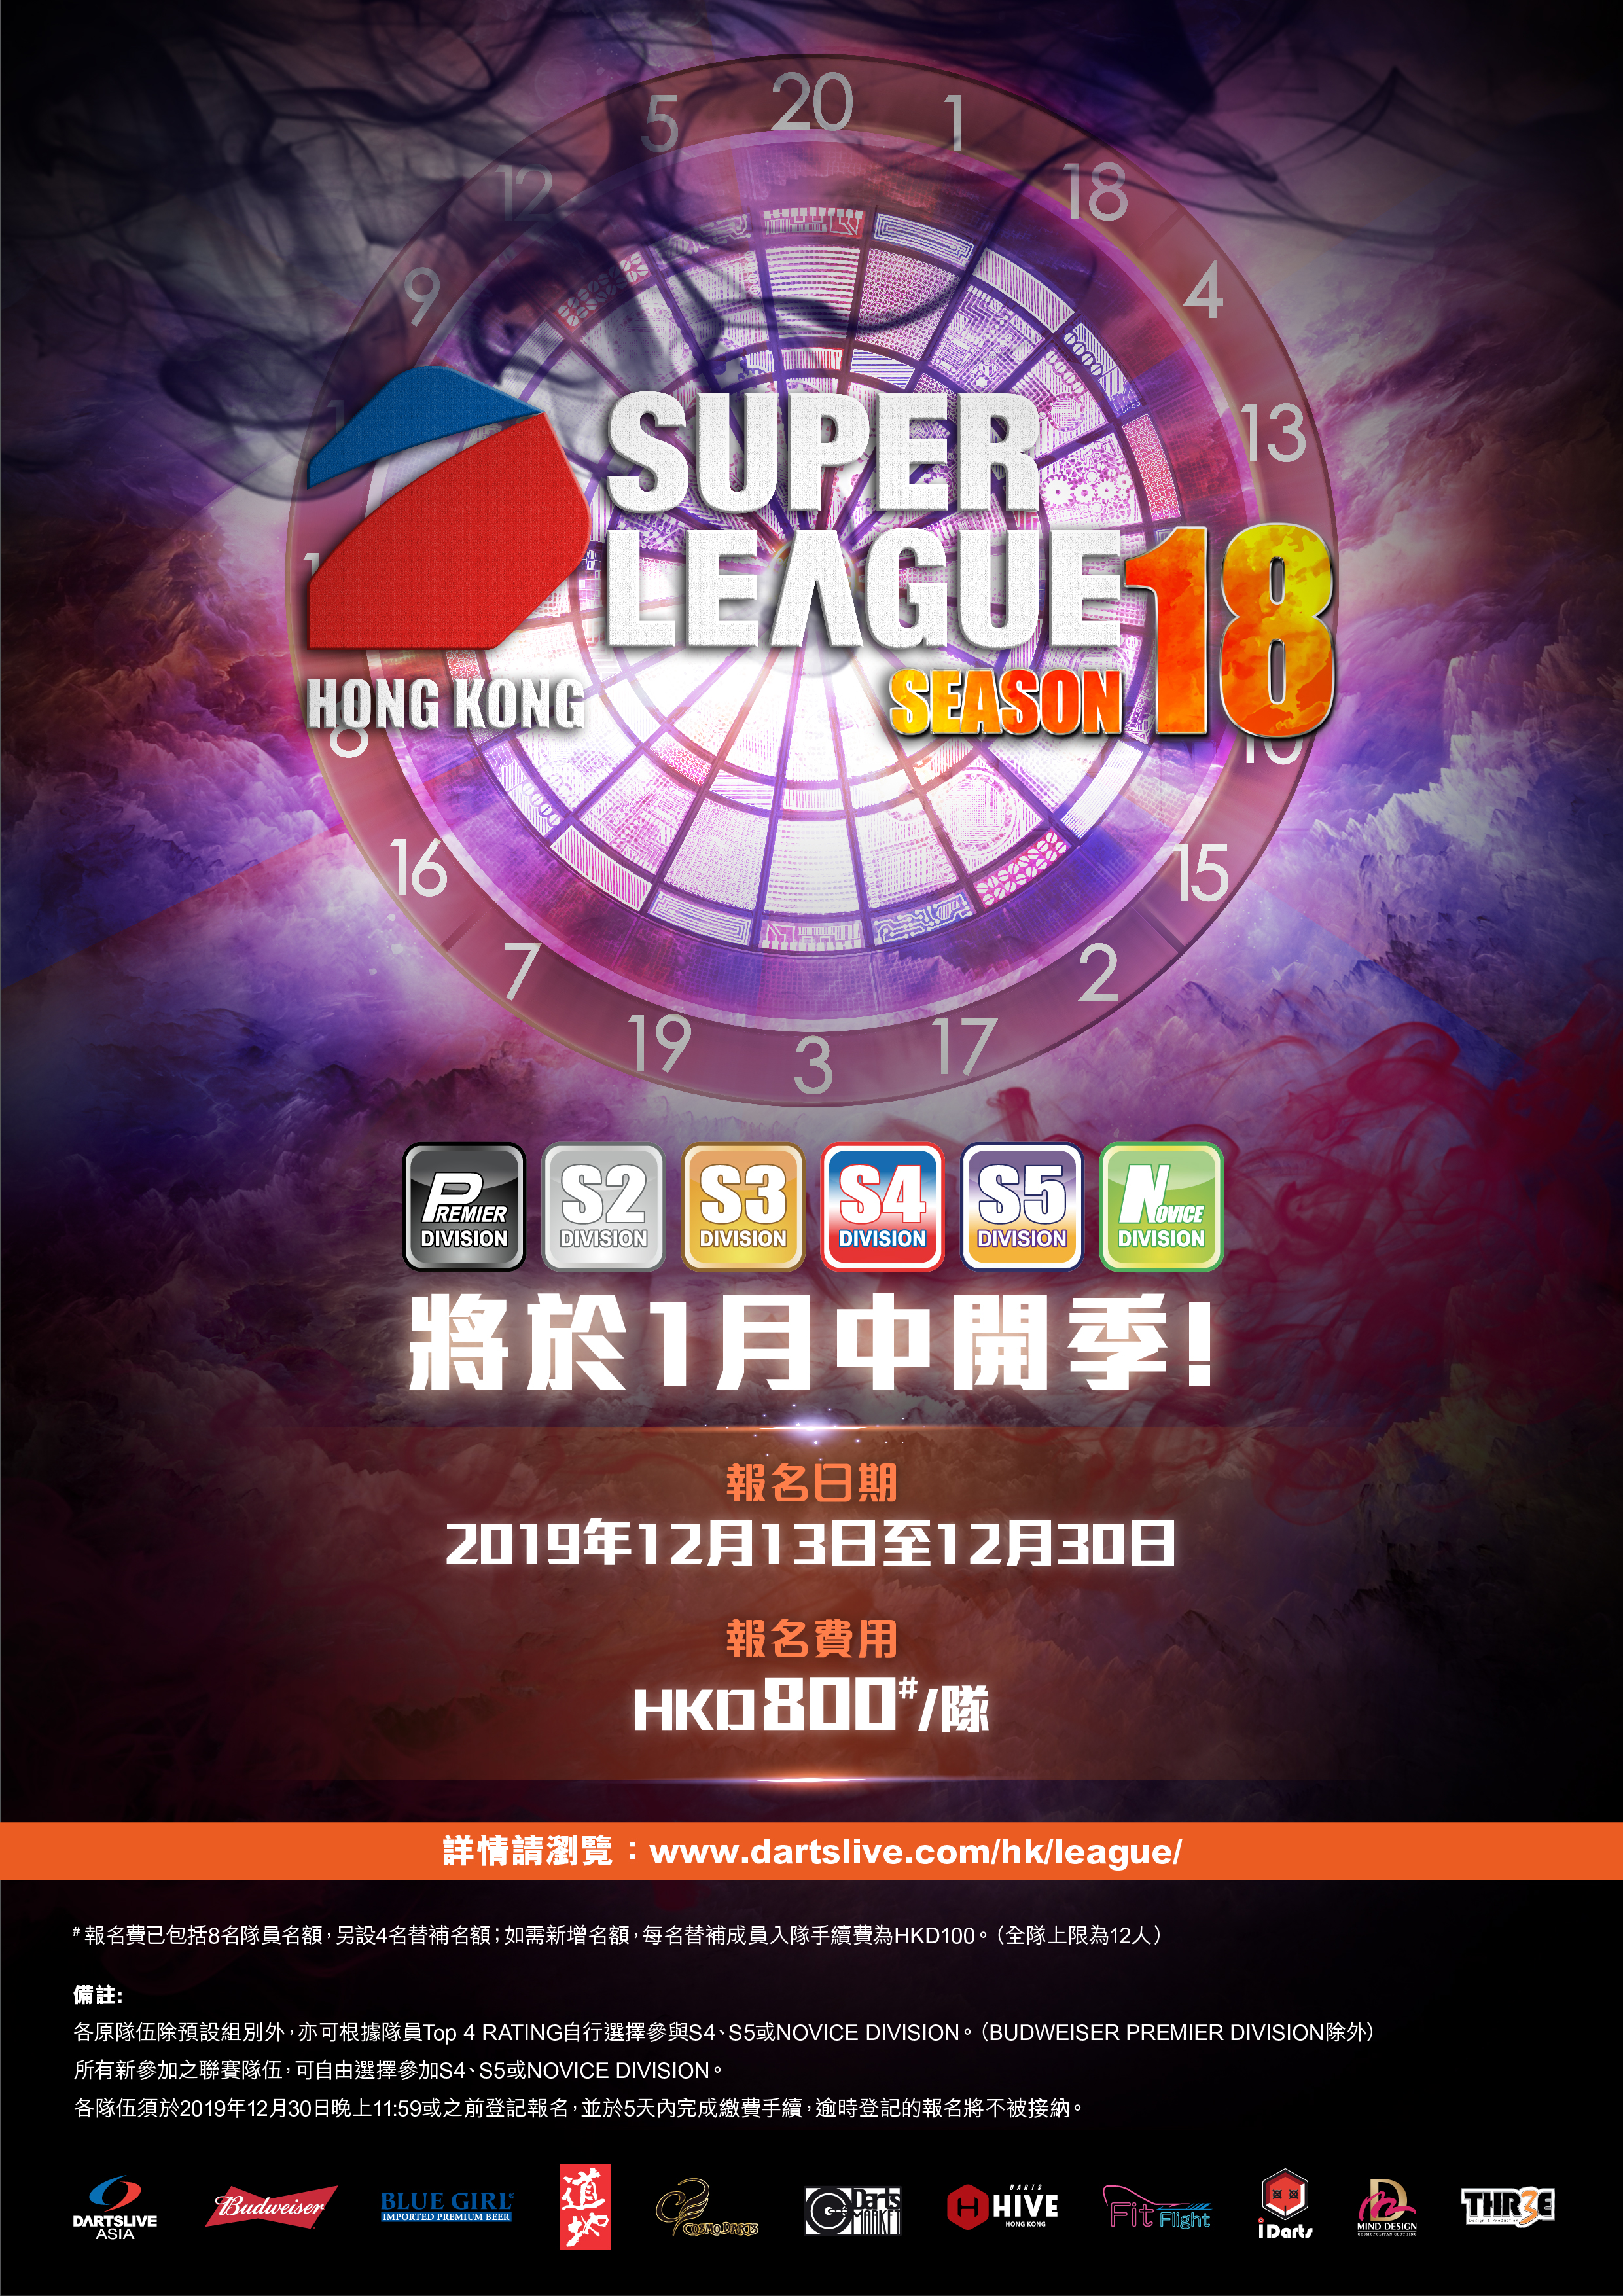 https://dl.cdn.dartslive.com/com/wp-content/uploads/2019/12/14031825/SUPER_LEAGUE_SEASON_18_Poster_4-01.jpg